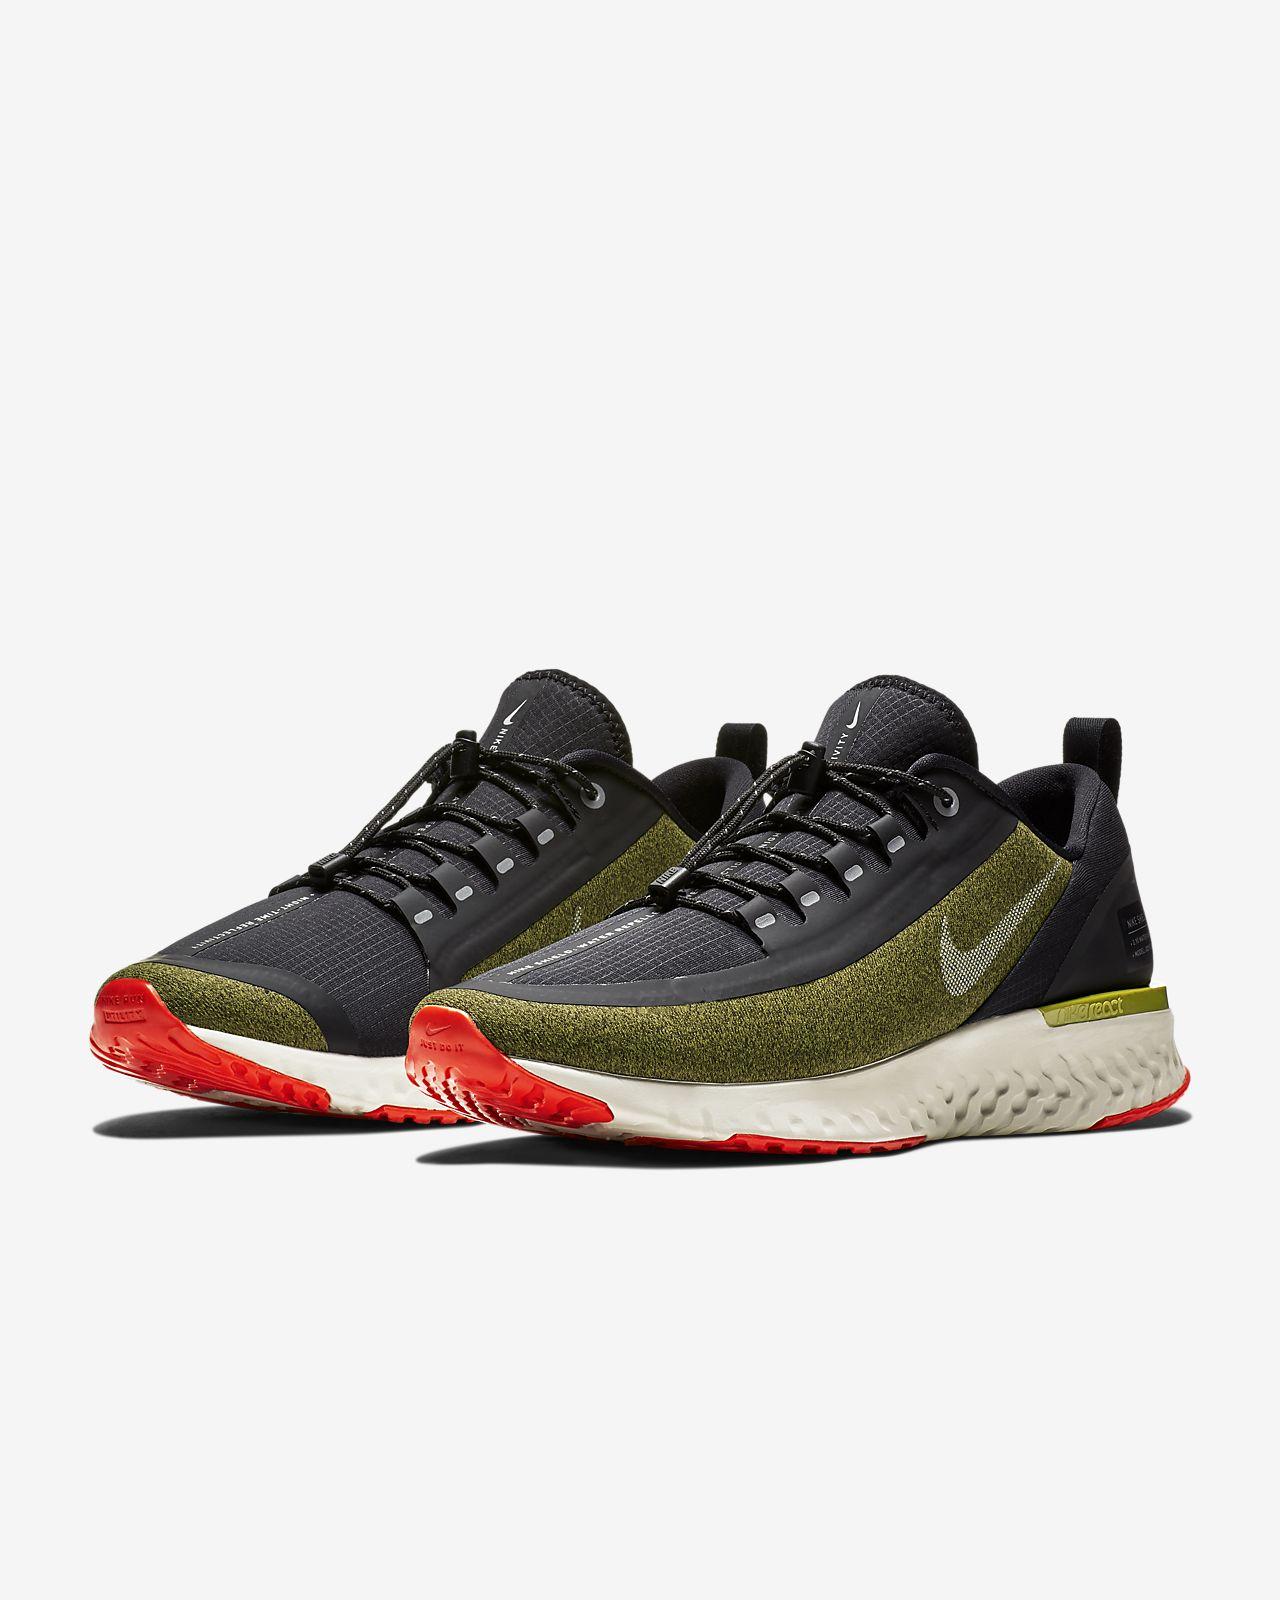 ba46d188c8f3c ... Calzado de running para hombre Nike Odyssey React Shield Water-Repellent